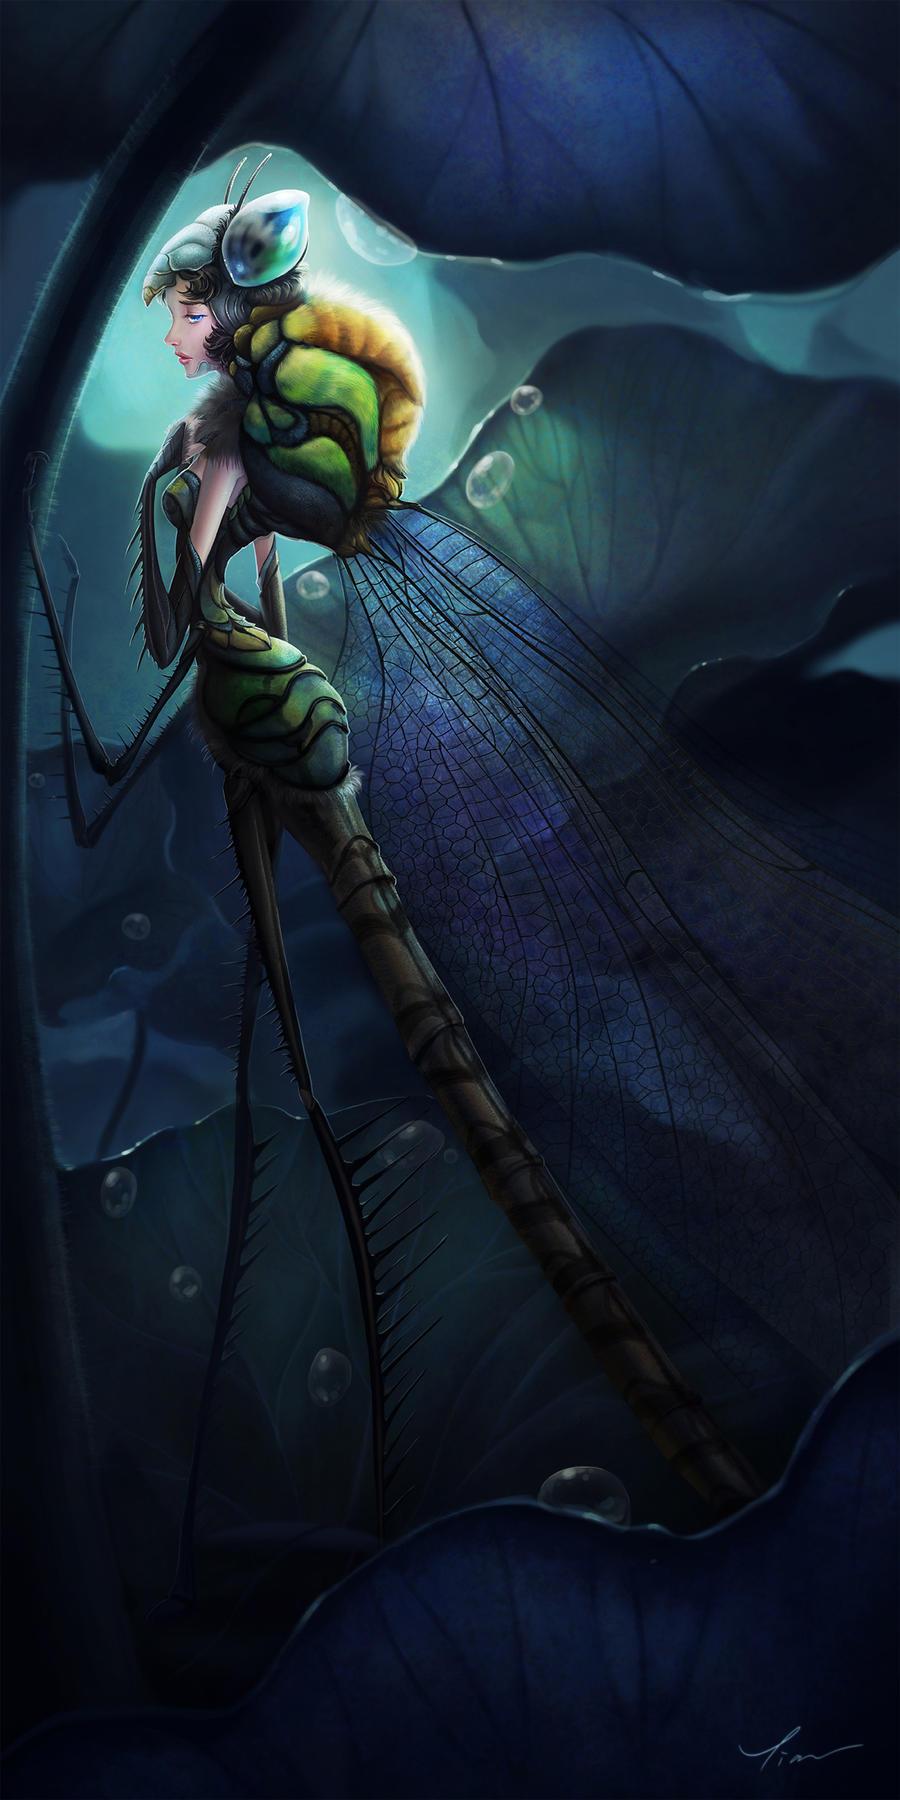 Dragonfly by yangtianli